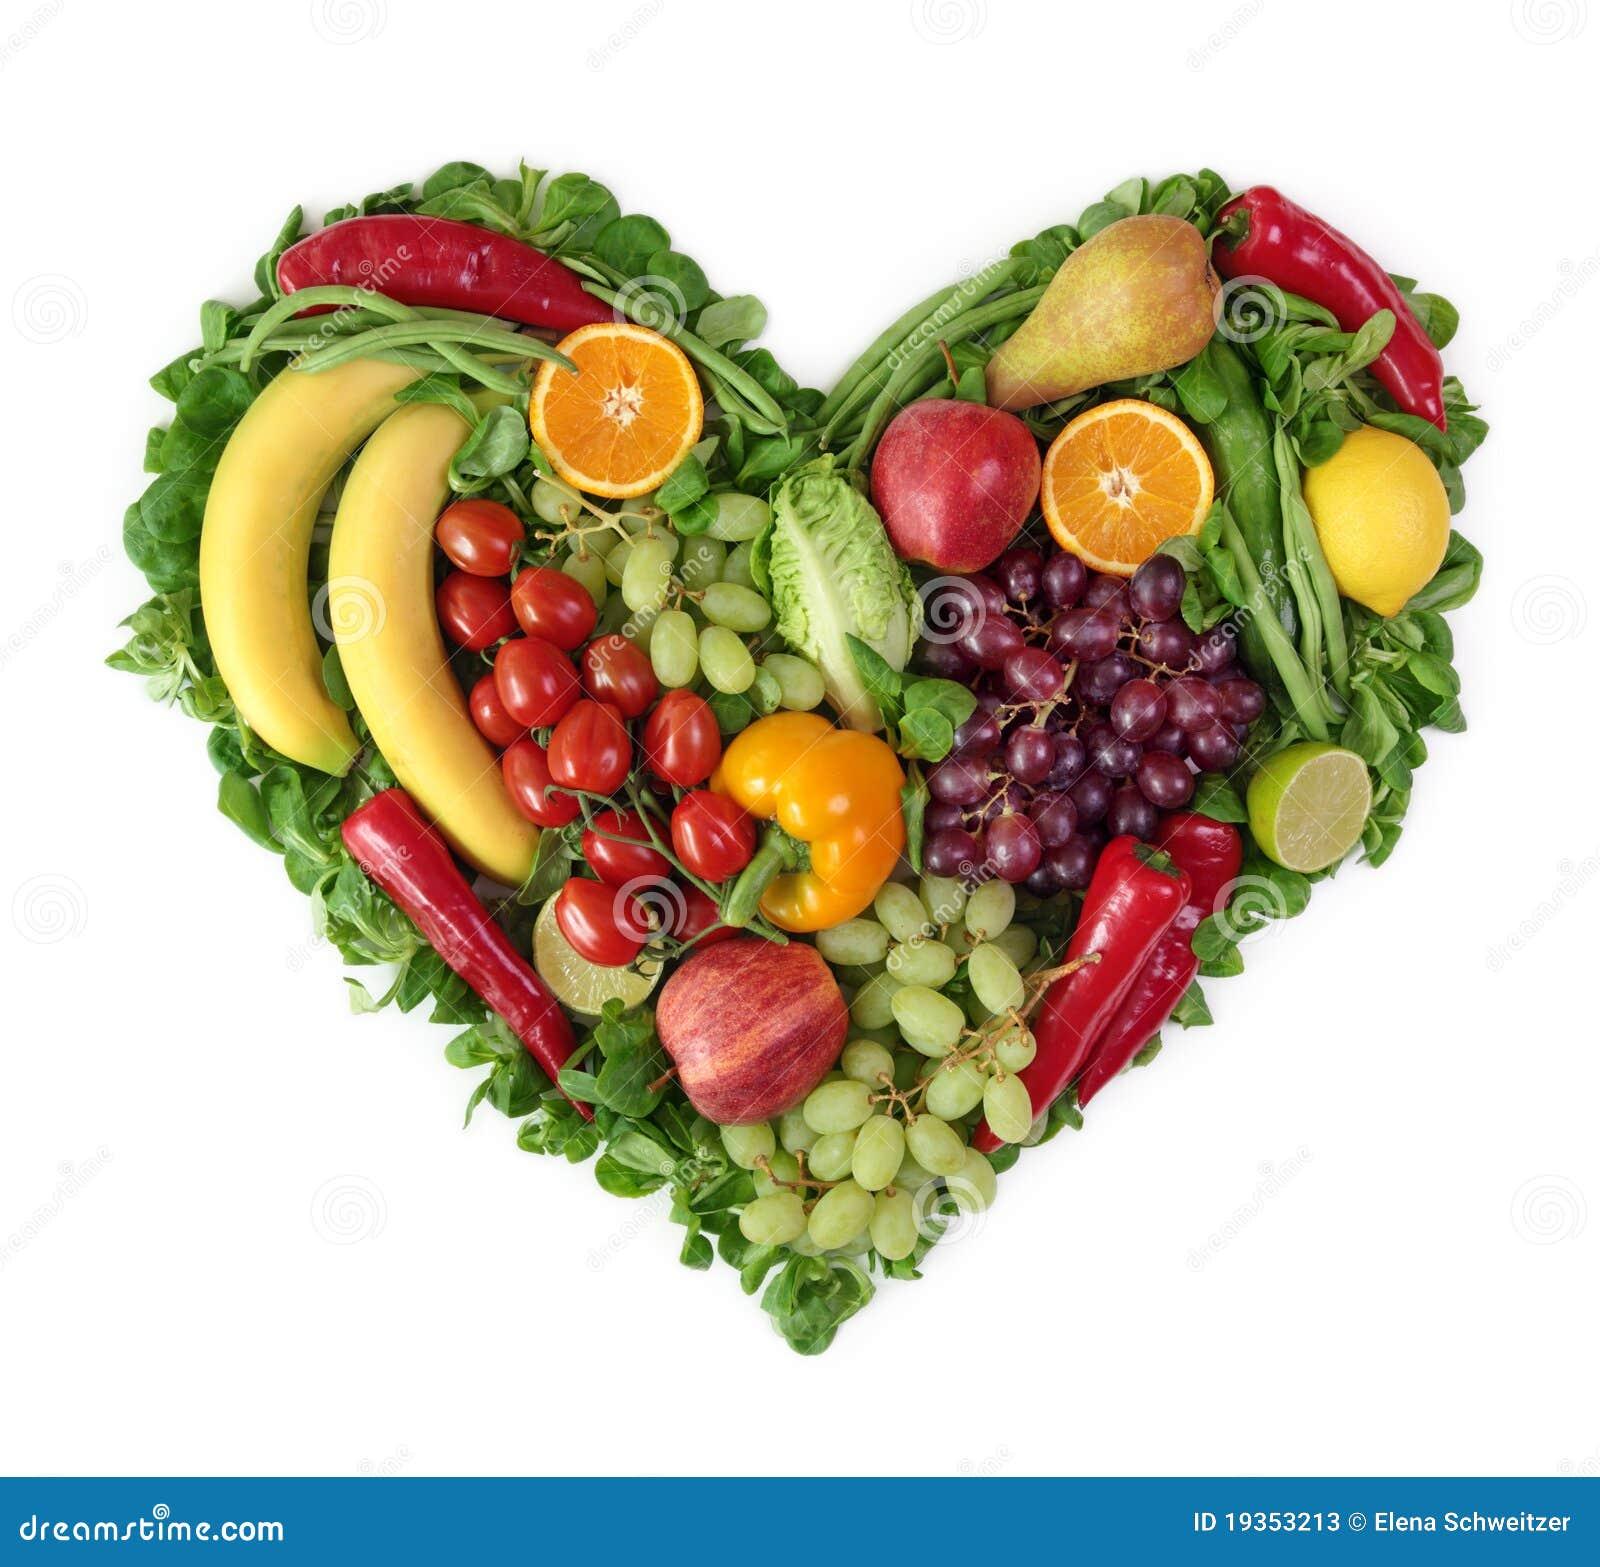 nl здоровое питание